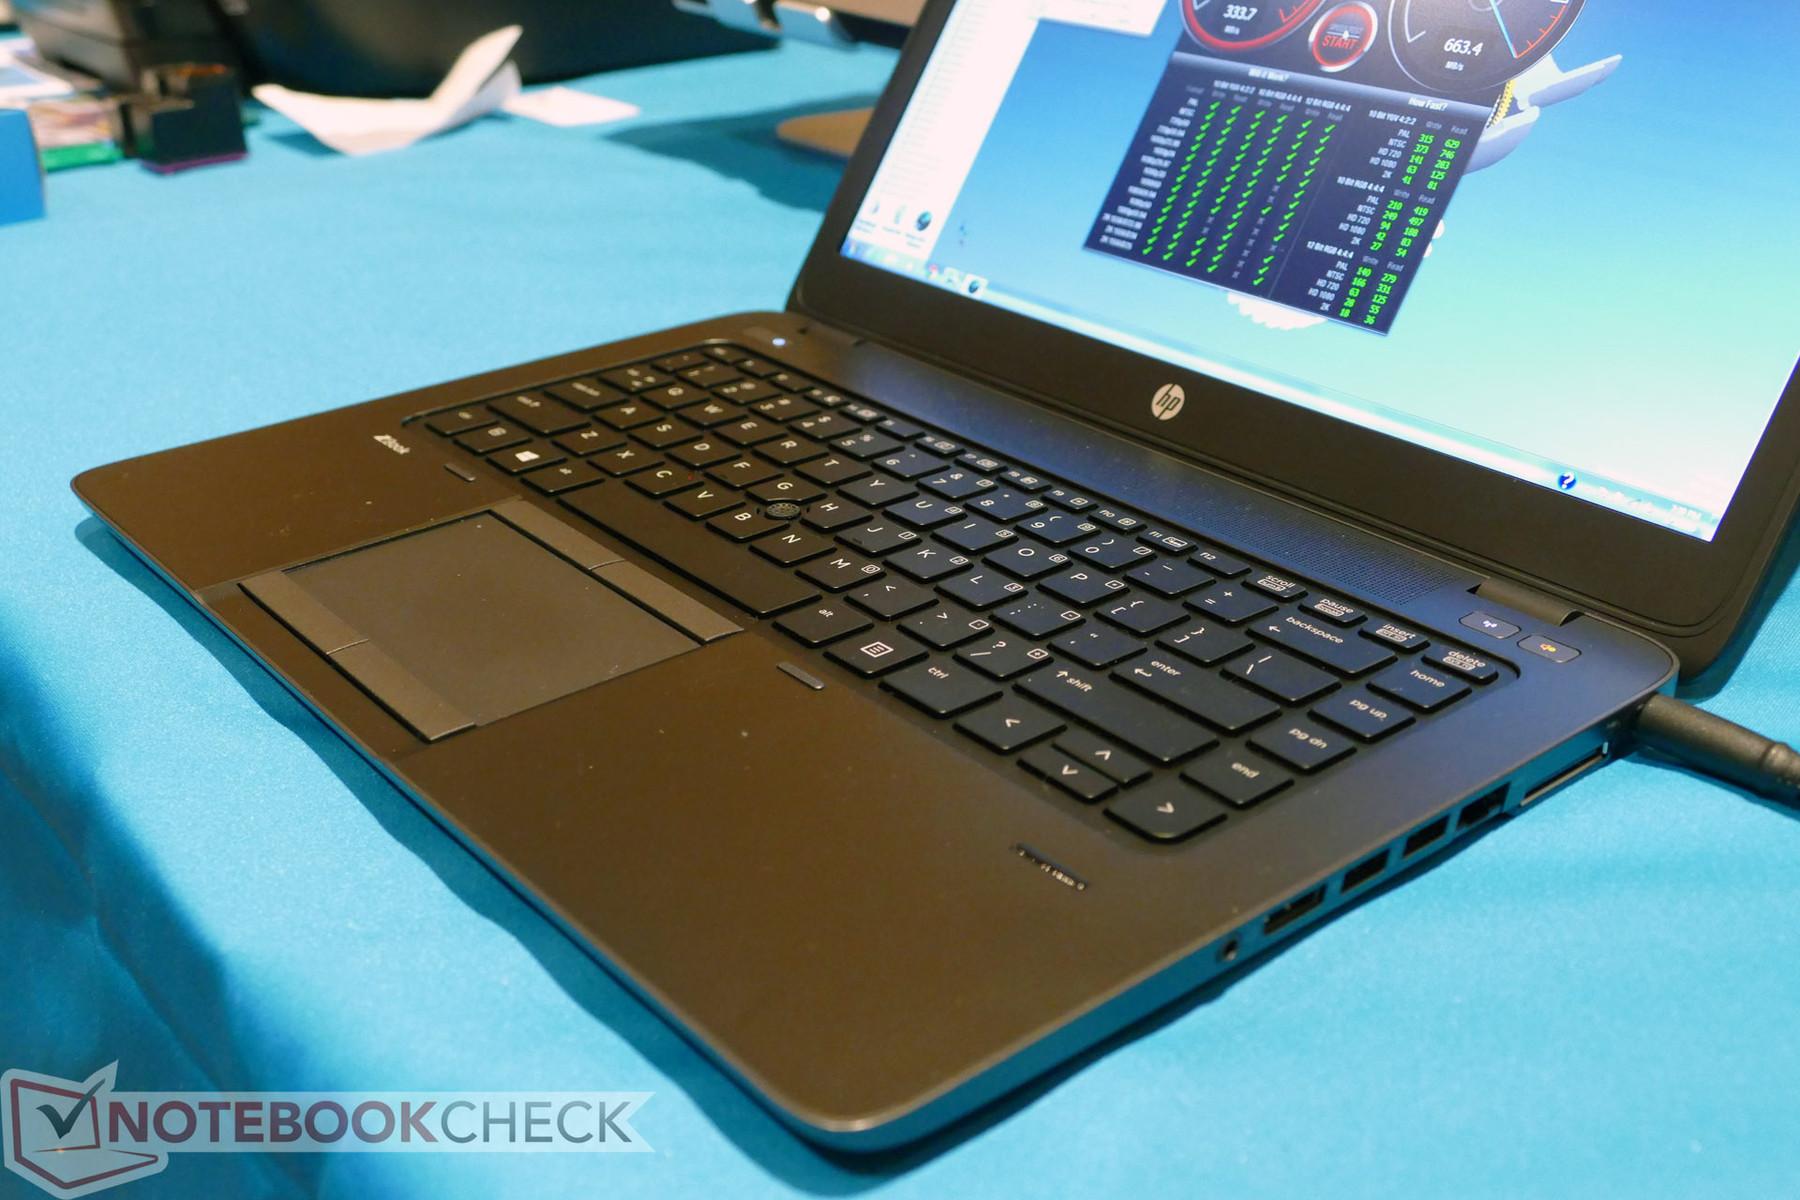 HP ZBook 14 系列 - Notebookcheck